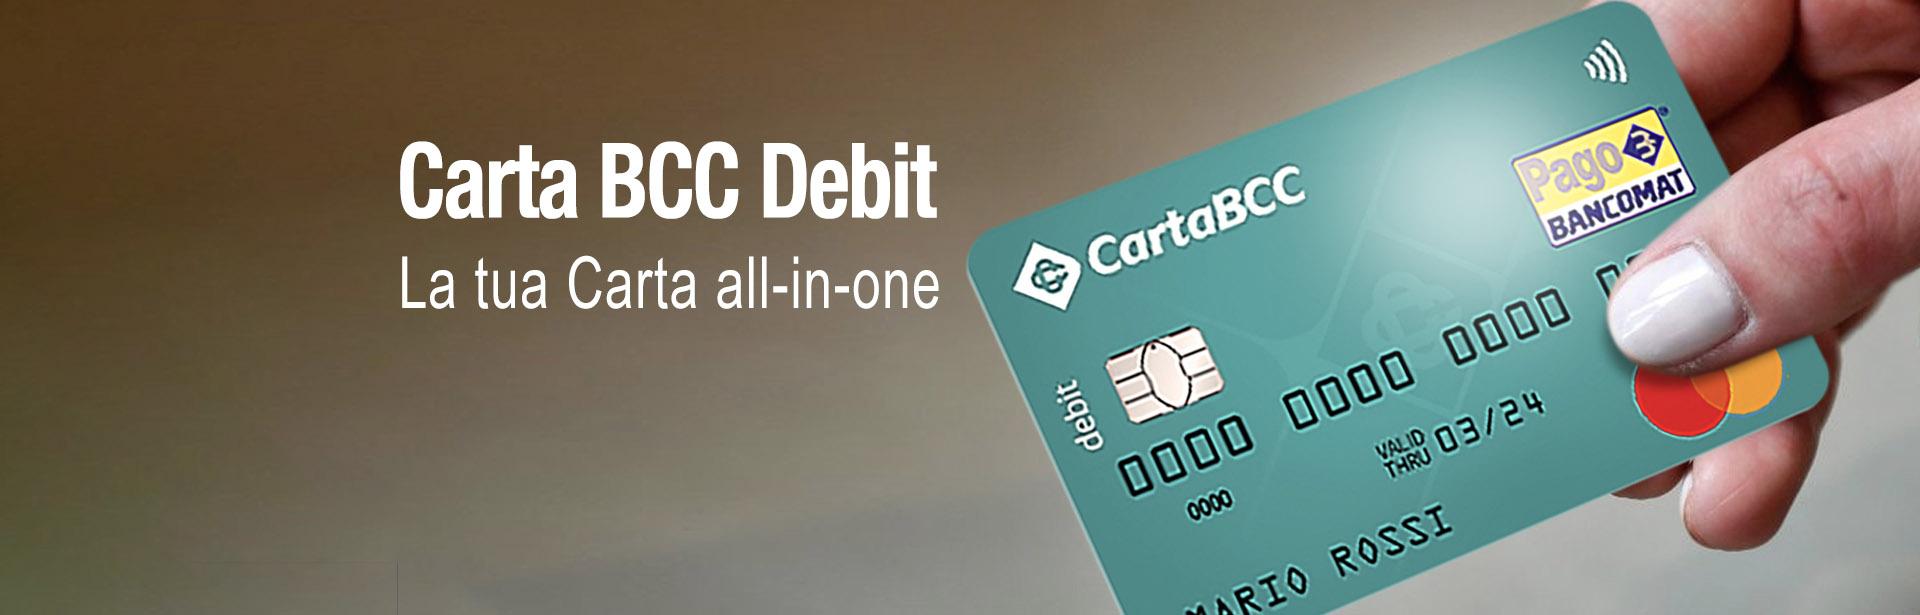 Carta BCC Debit